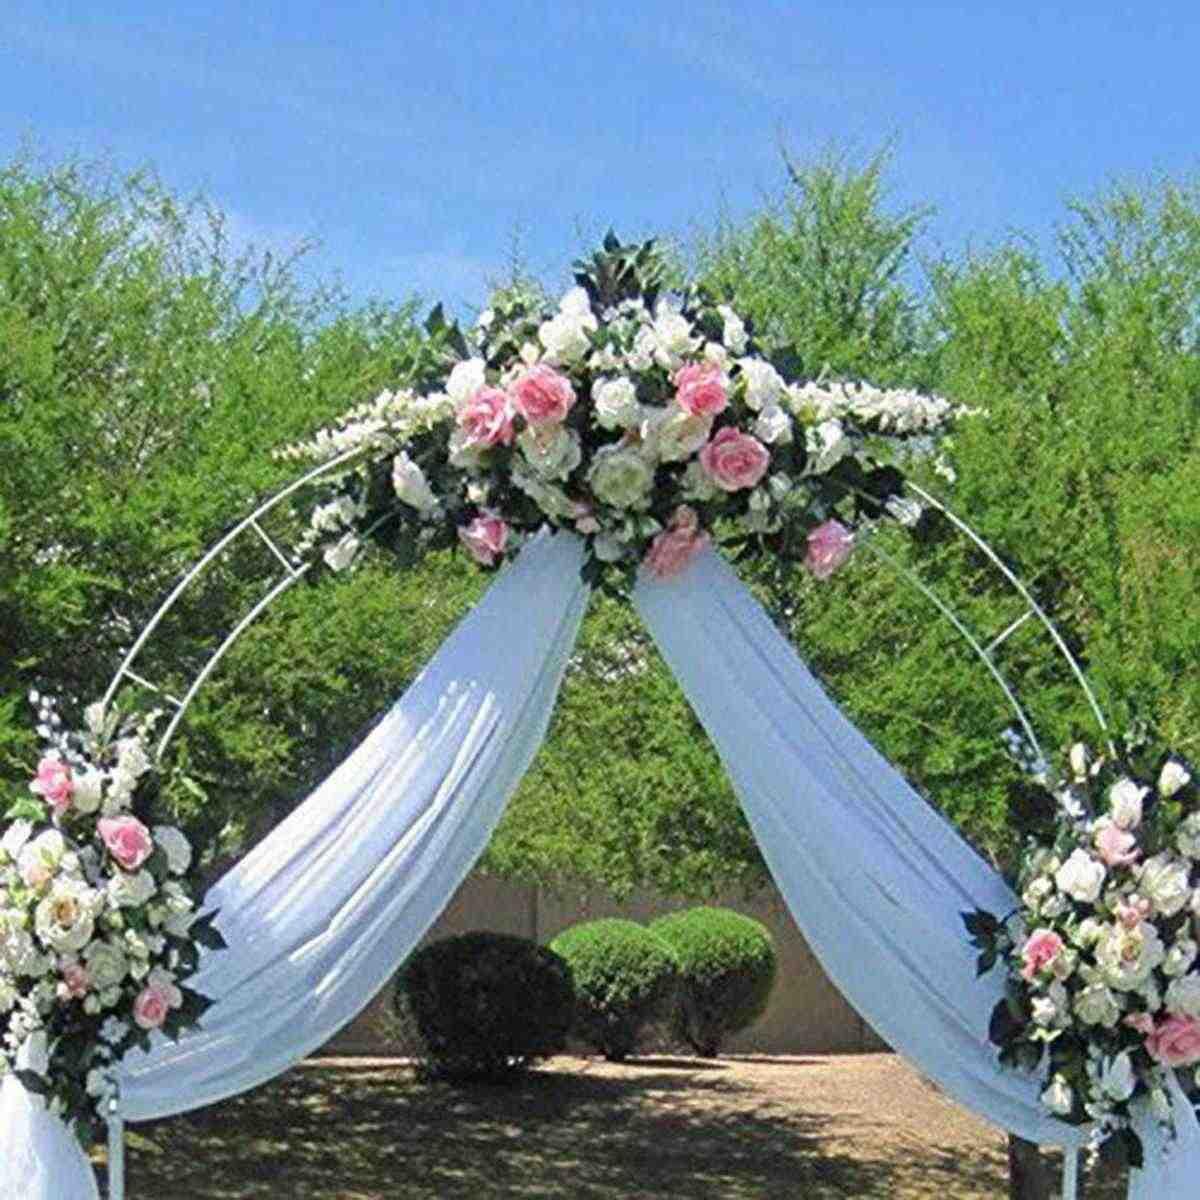 DIY Wedding Arch Decorative Garden Backdrop Pergola Stand Flower Frame For Marriage birthday wedding Party Decoration